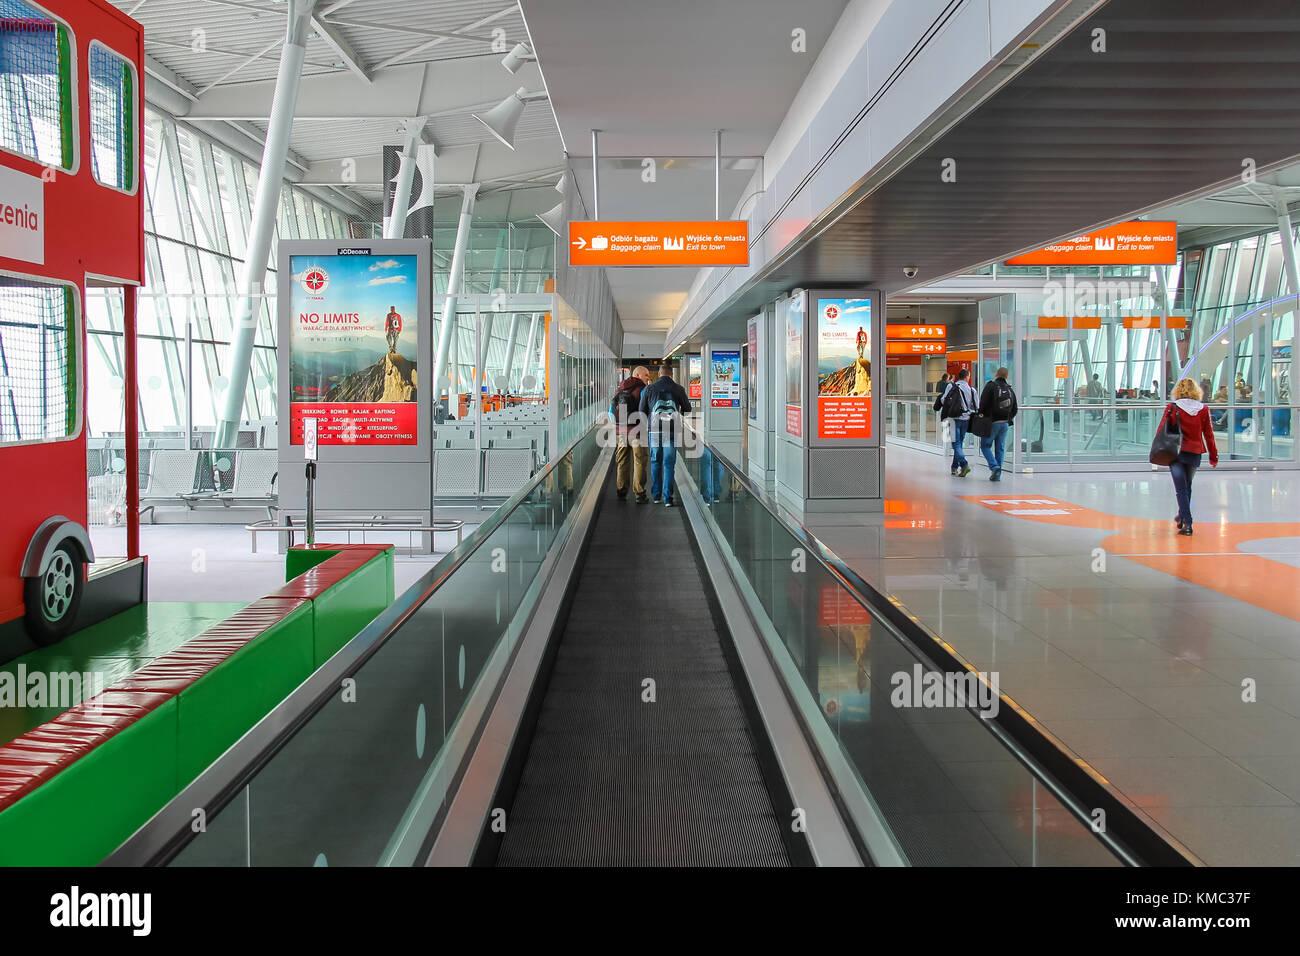 Aeroporto Waw : Warsaw poland apr 18 2015: passengers walking through arrival